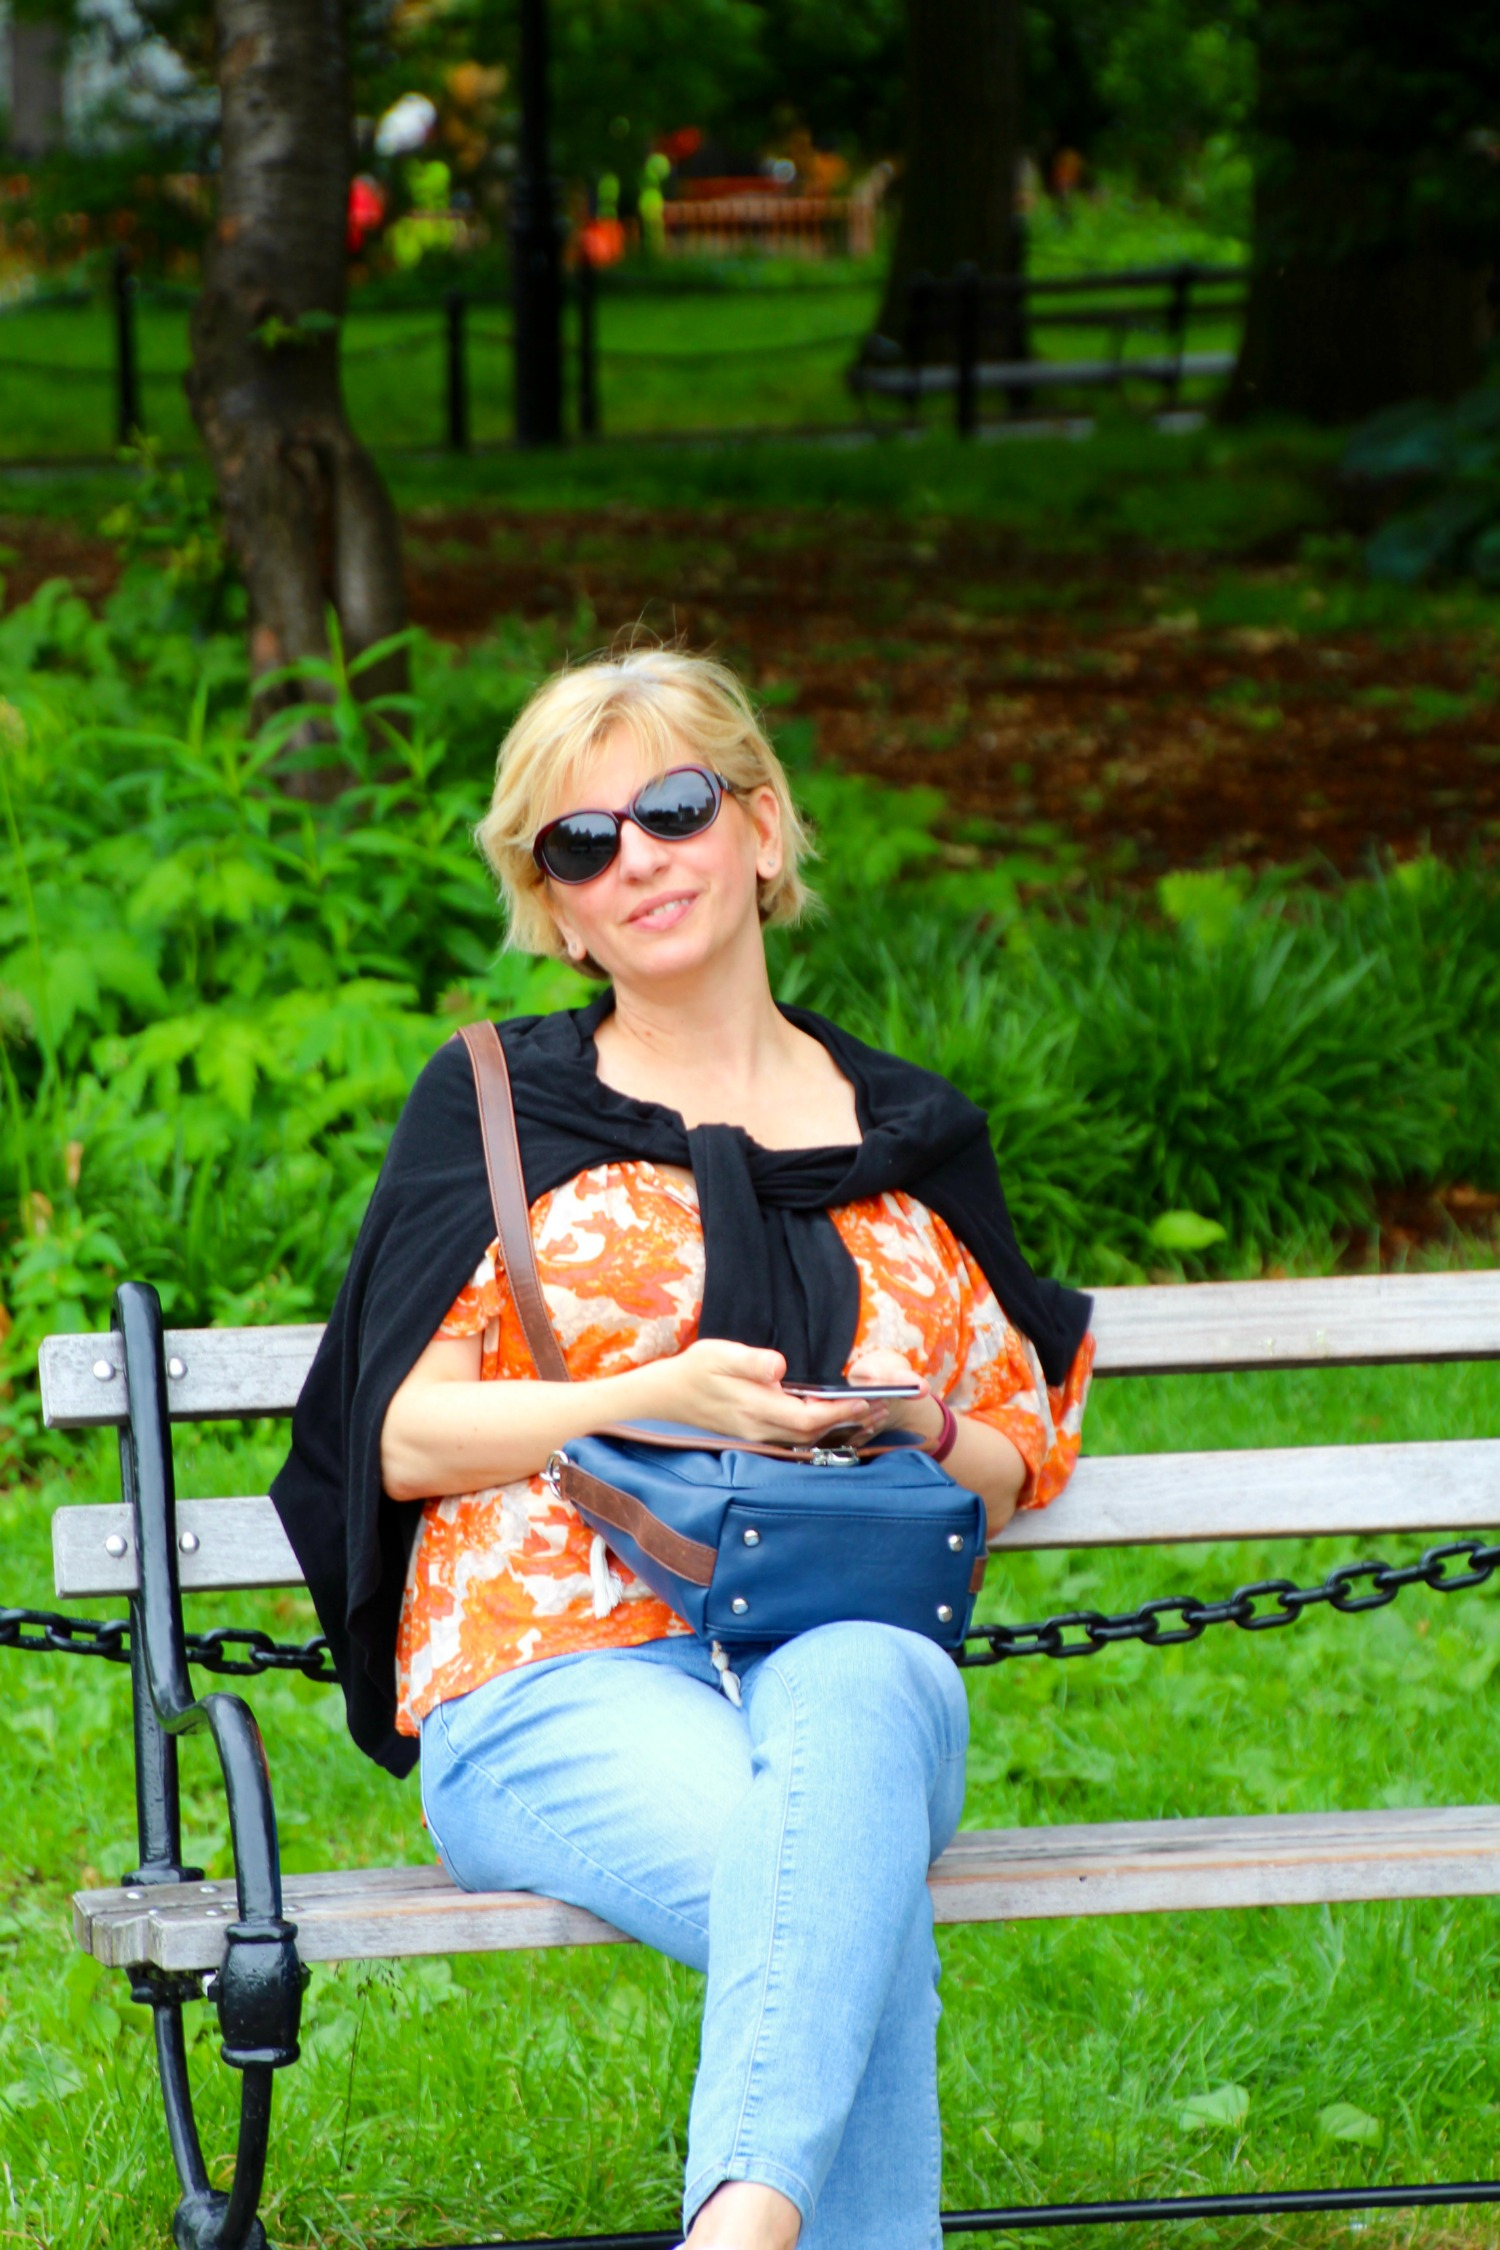 Resting in Washington Square Park